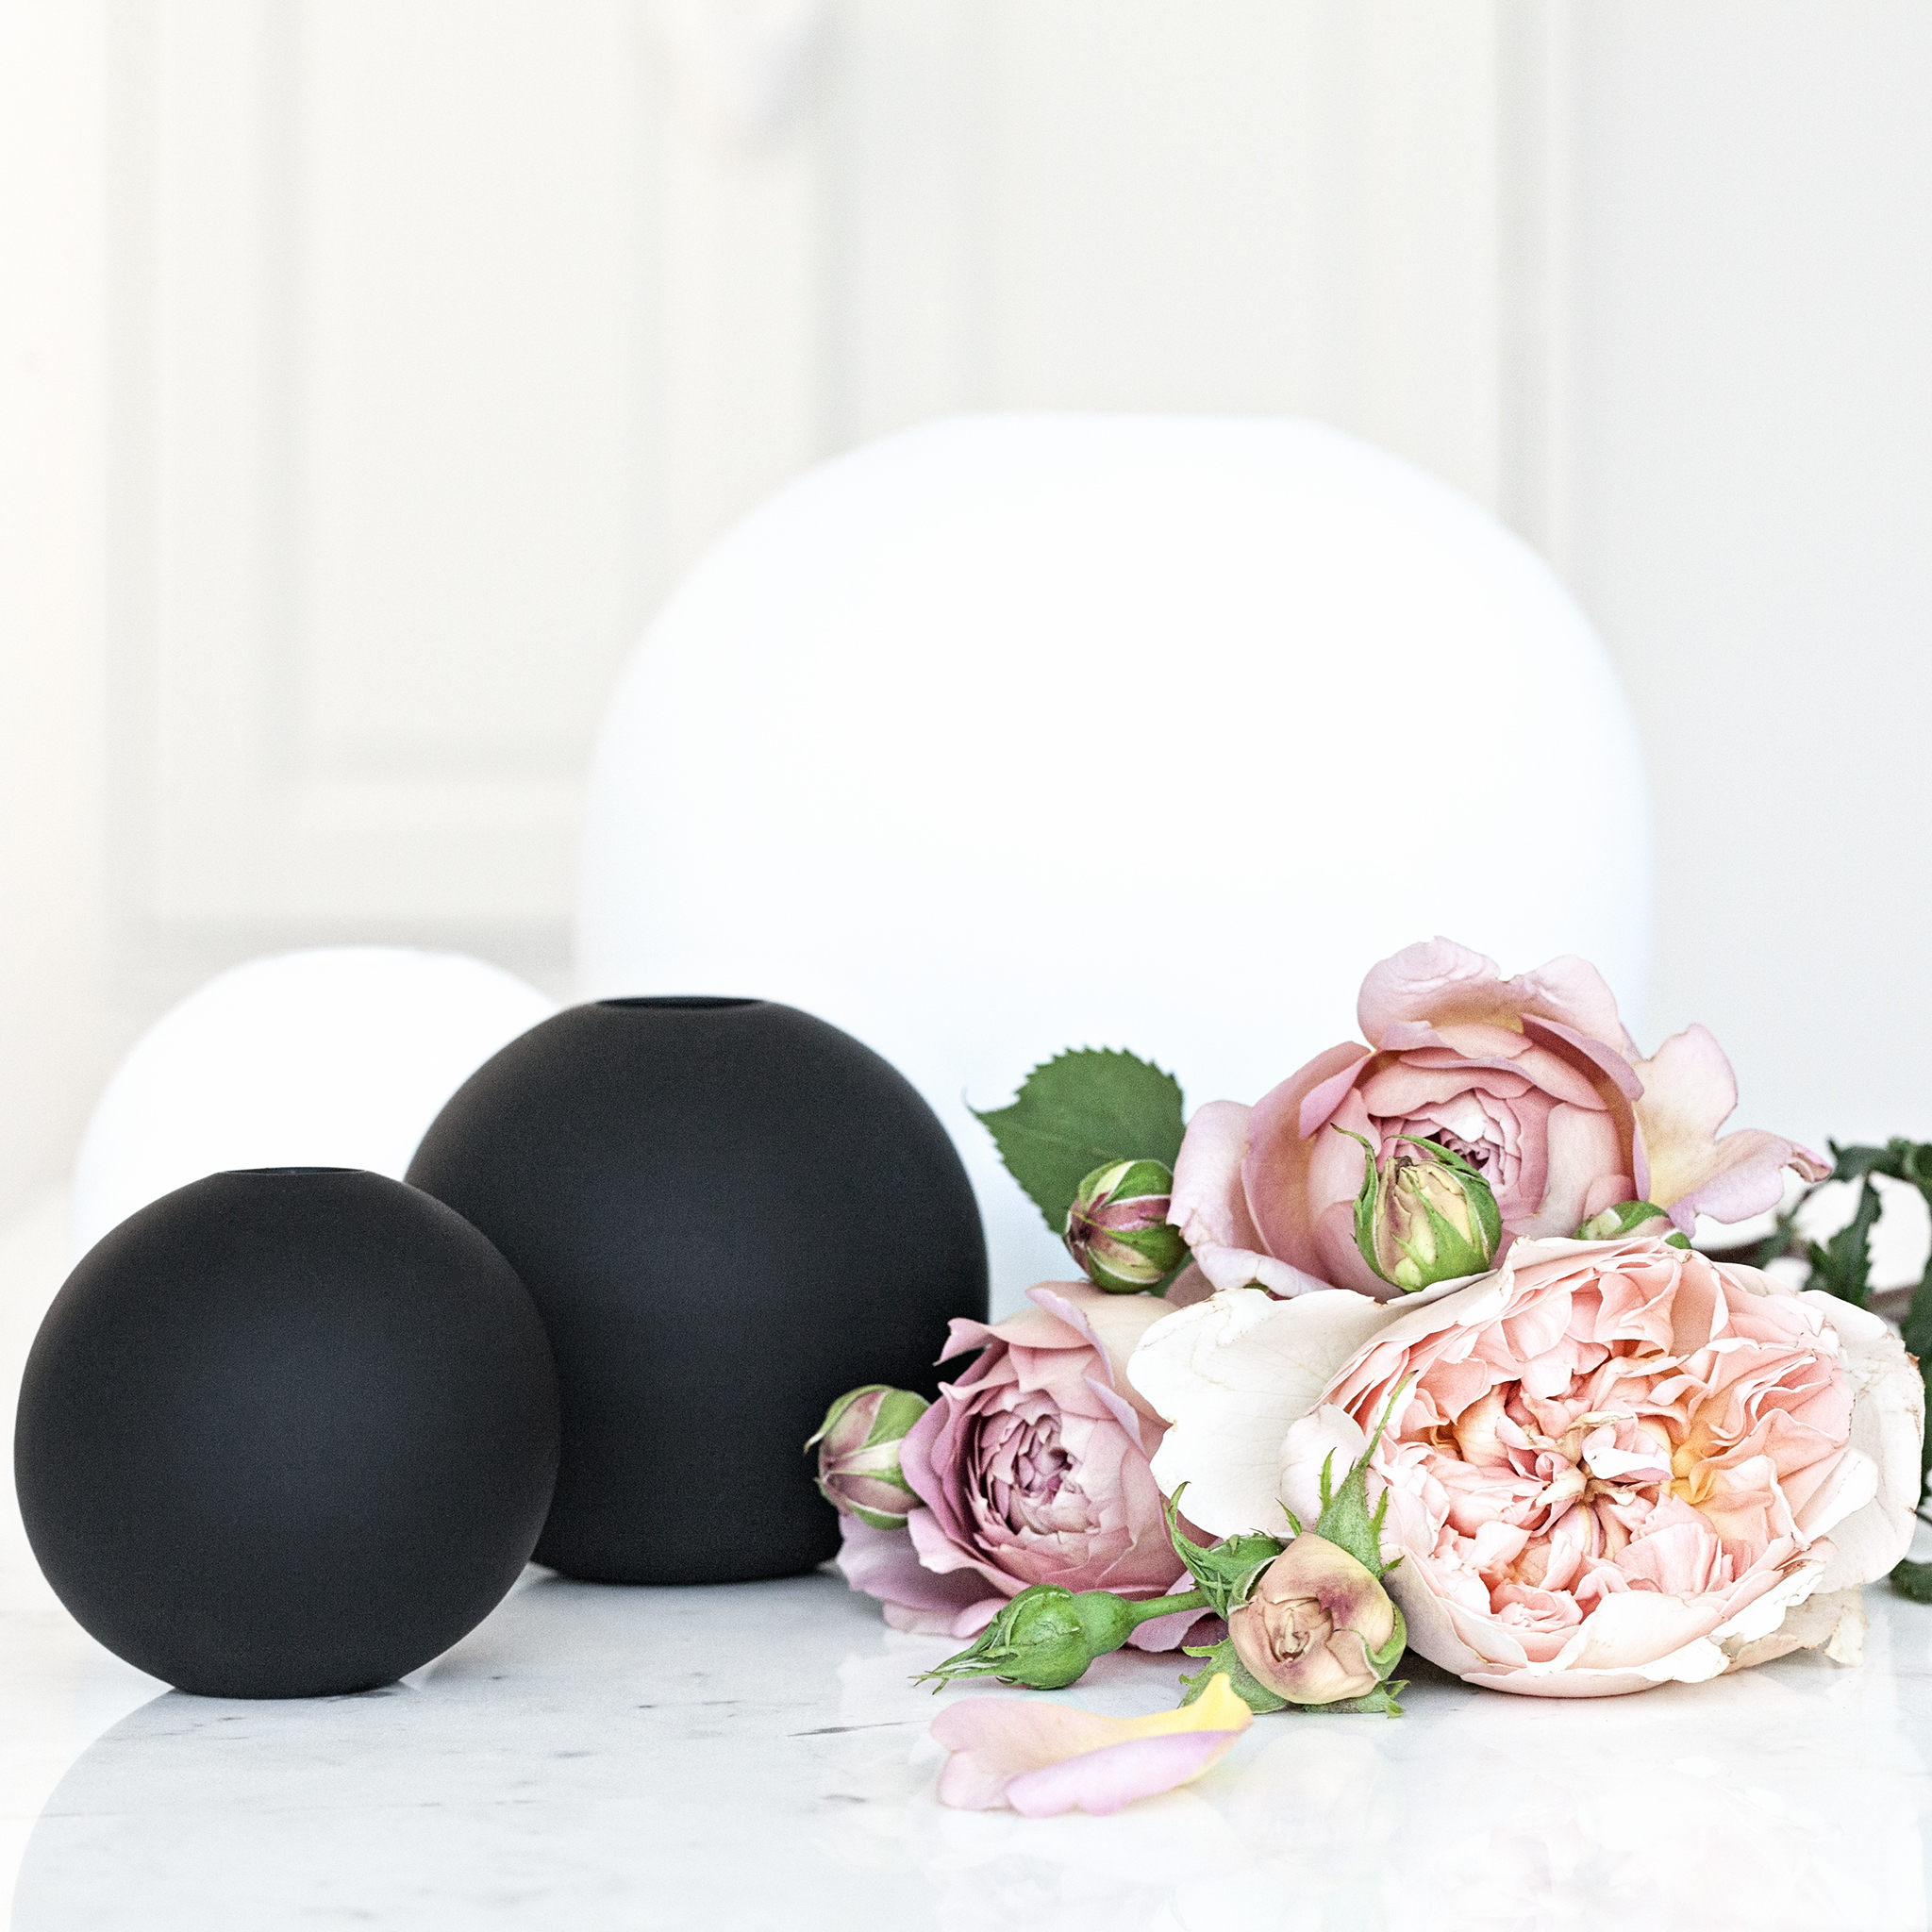 Cooee Design Ceramic Vases in Black and White | Serax Belgium Marble Table